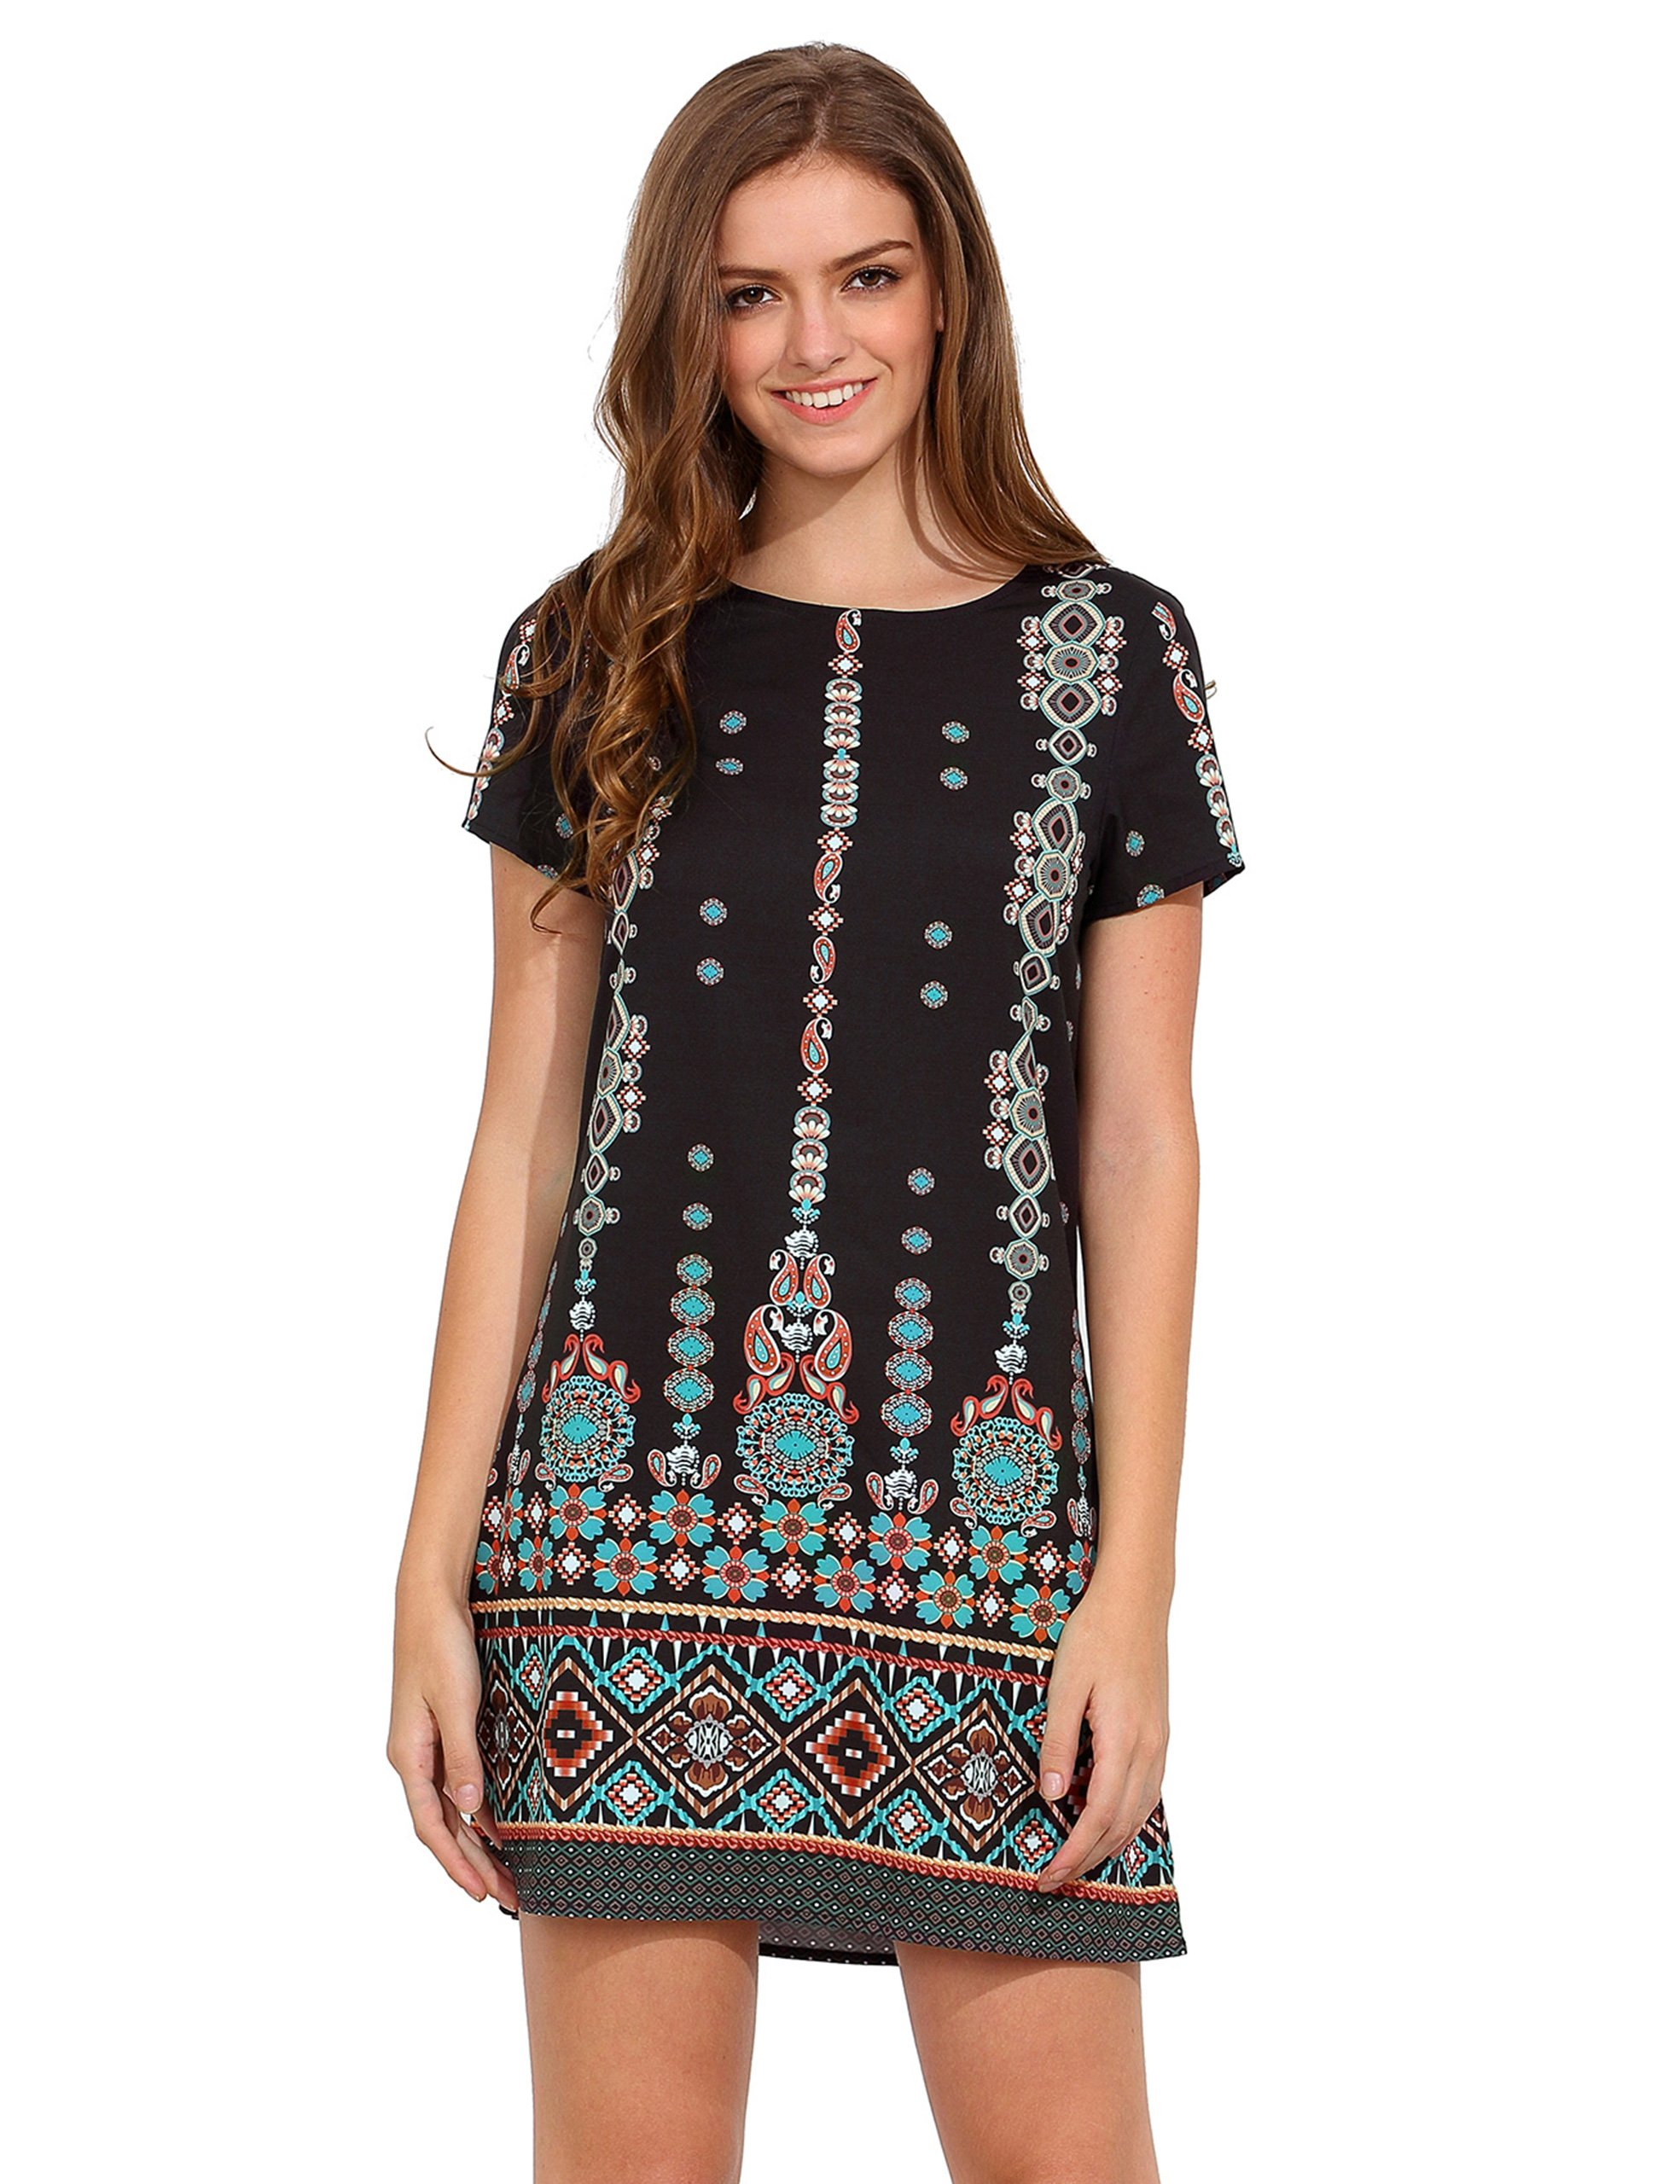 Milumia Women's Bohemian Aztec Print Ethnic Style Summer Shift Dress Black S